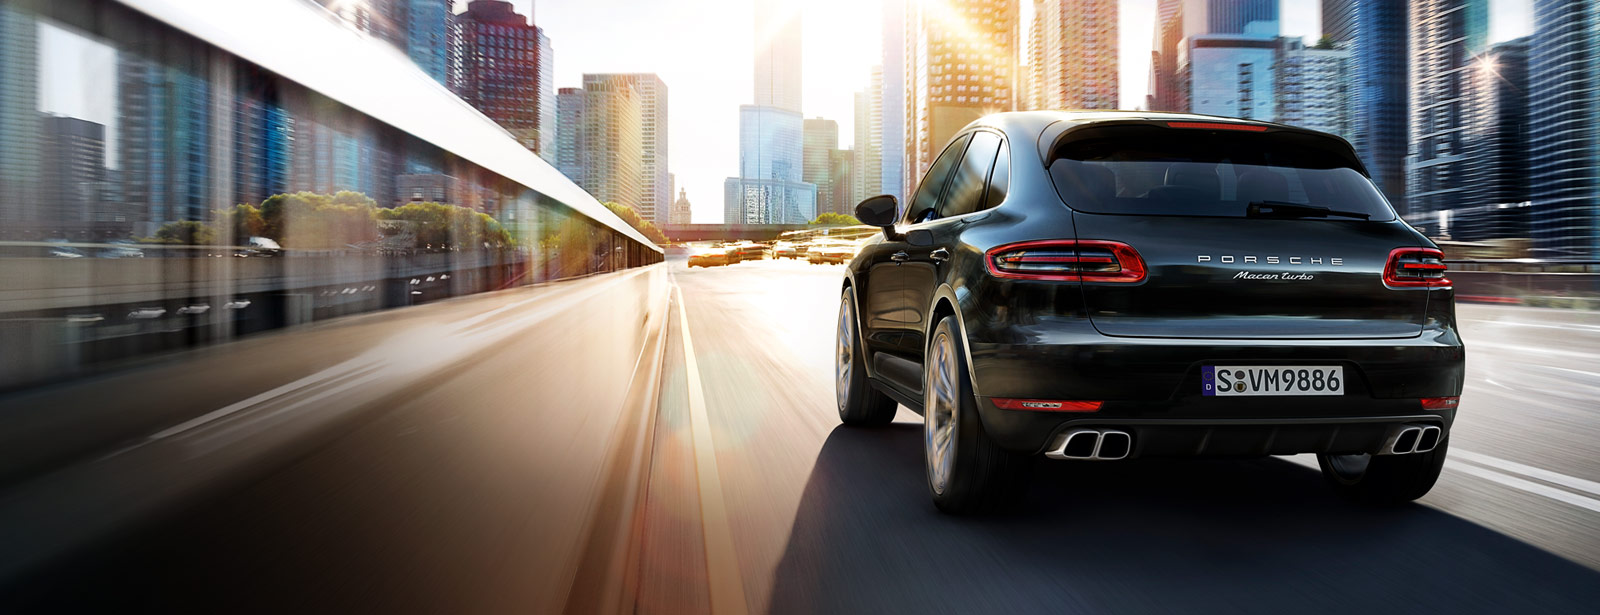 2017 Porsche Macan Turbo near Los Angeles